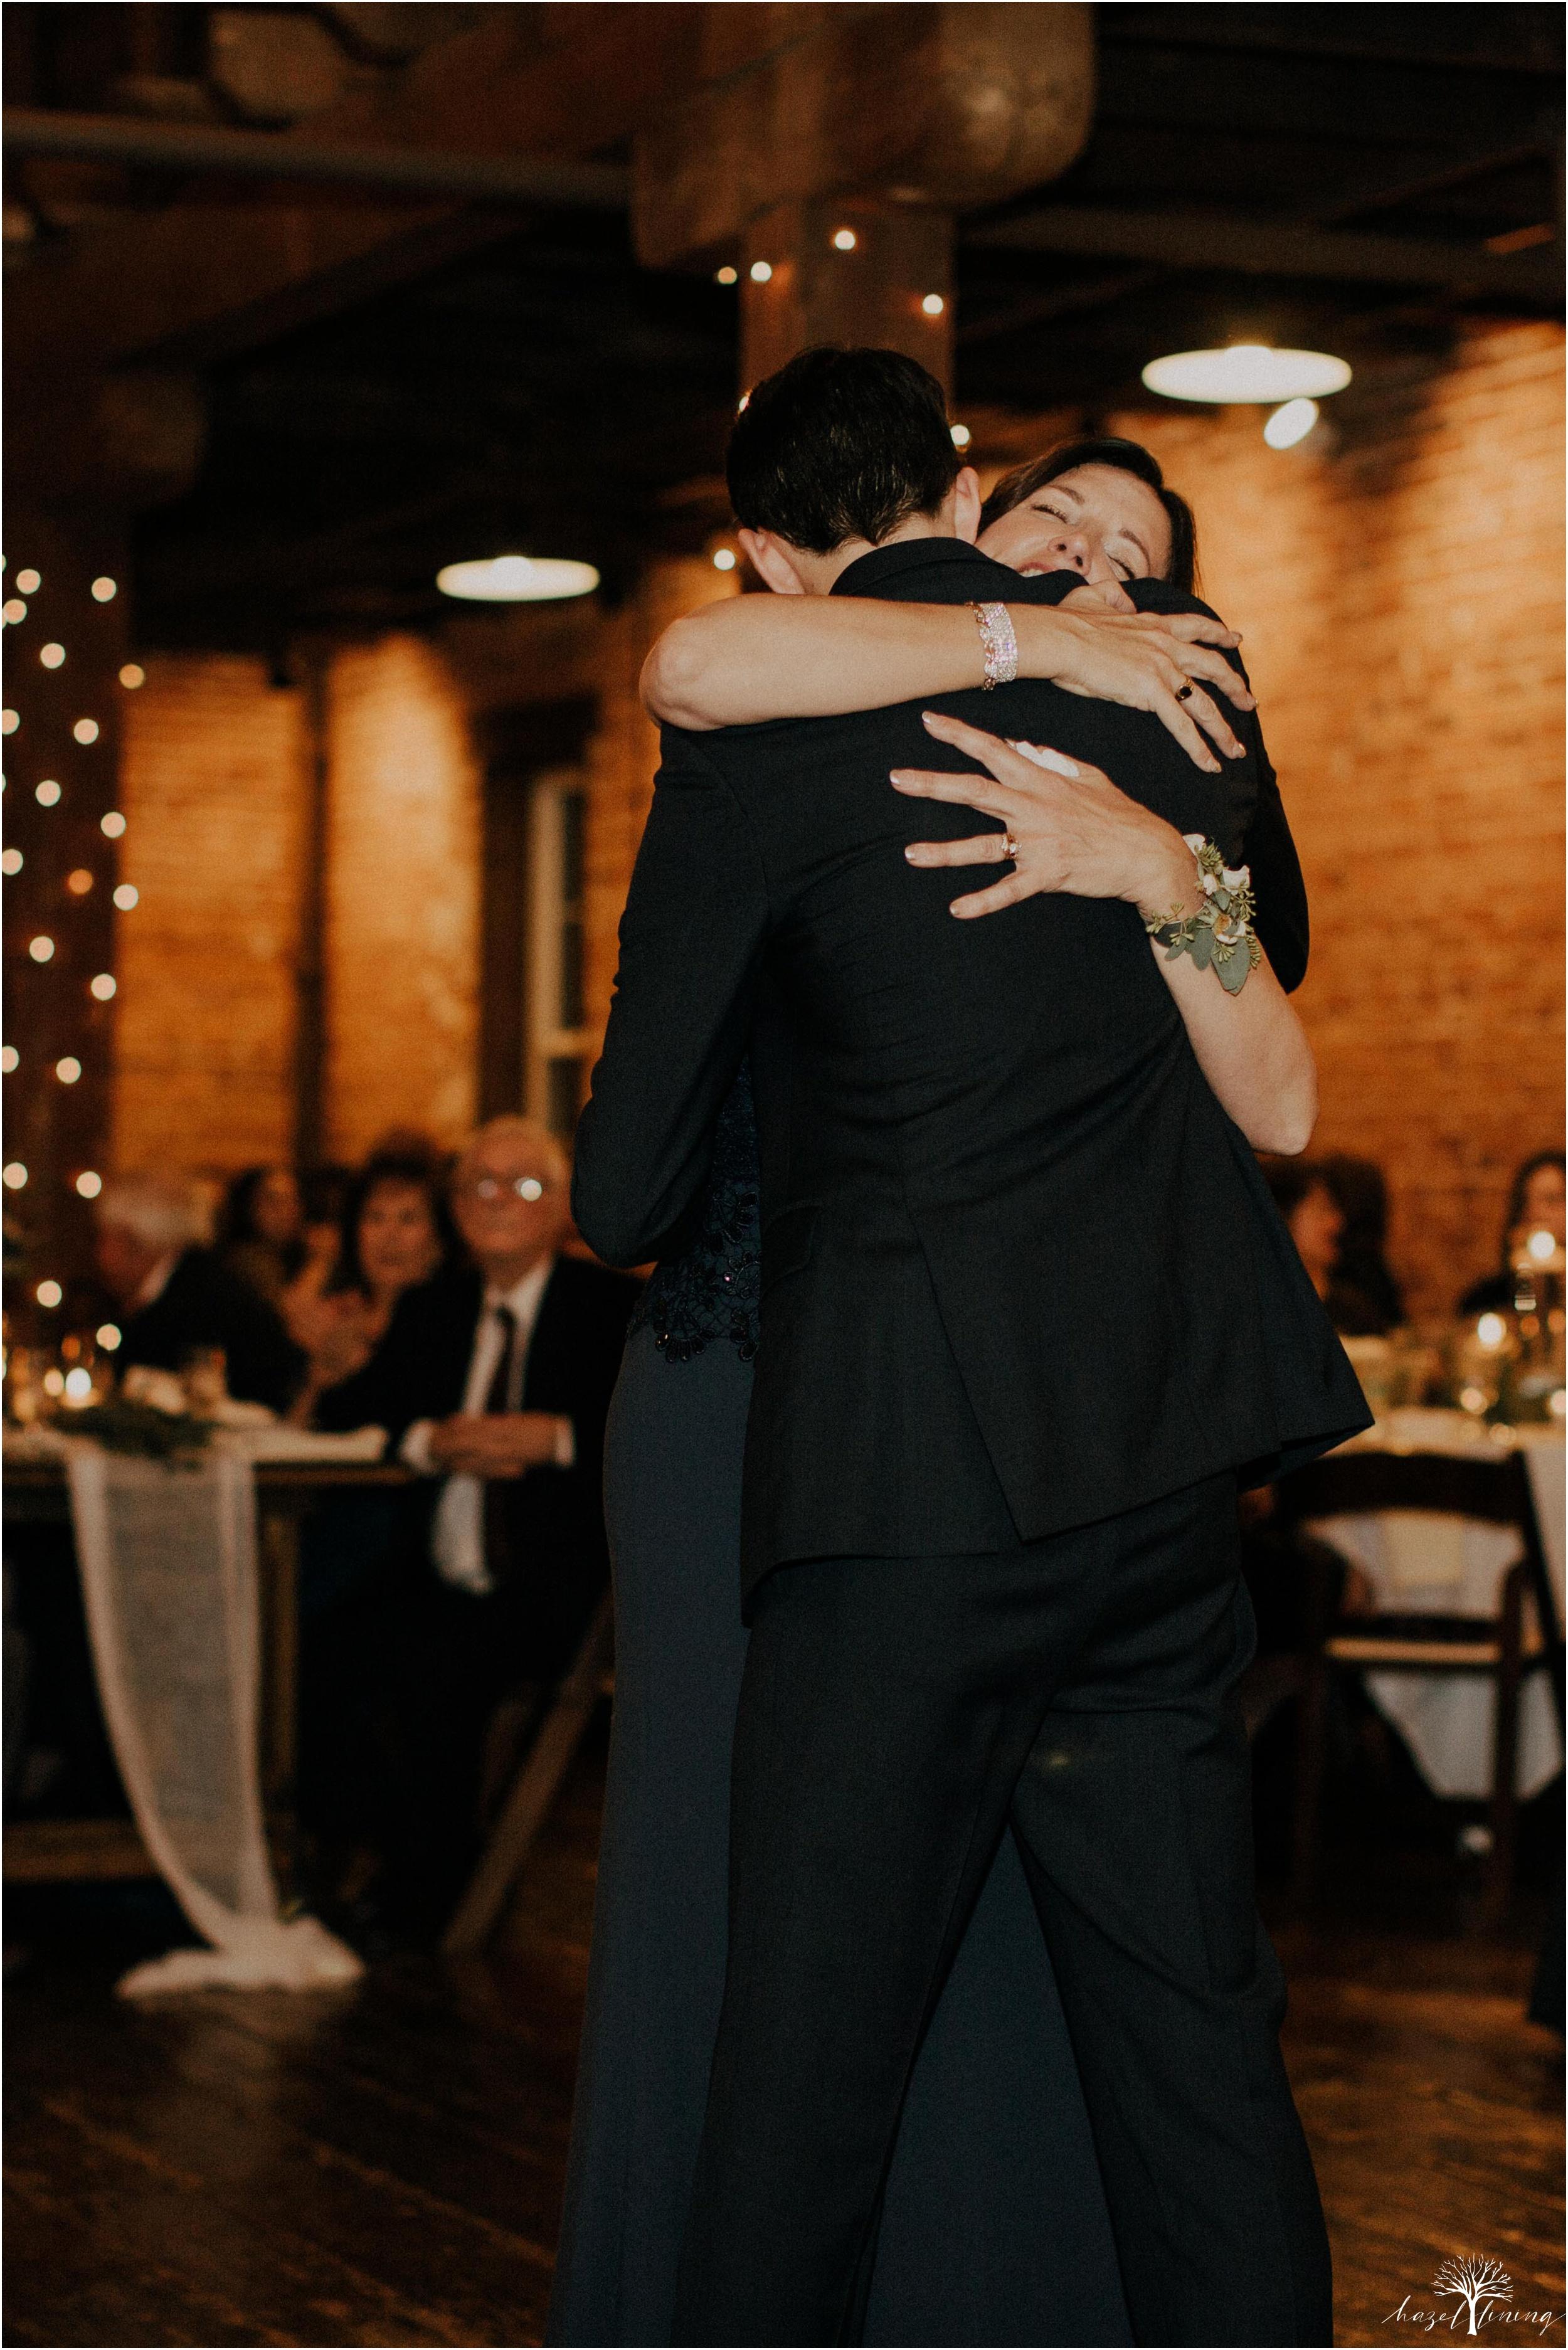 emma-matt-gehringer-the-booking-house-lancaster-manhiem-pennsylvania-winter-wedding_0158.jpg